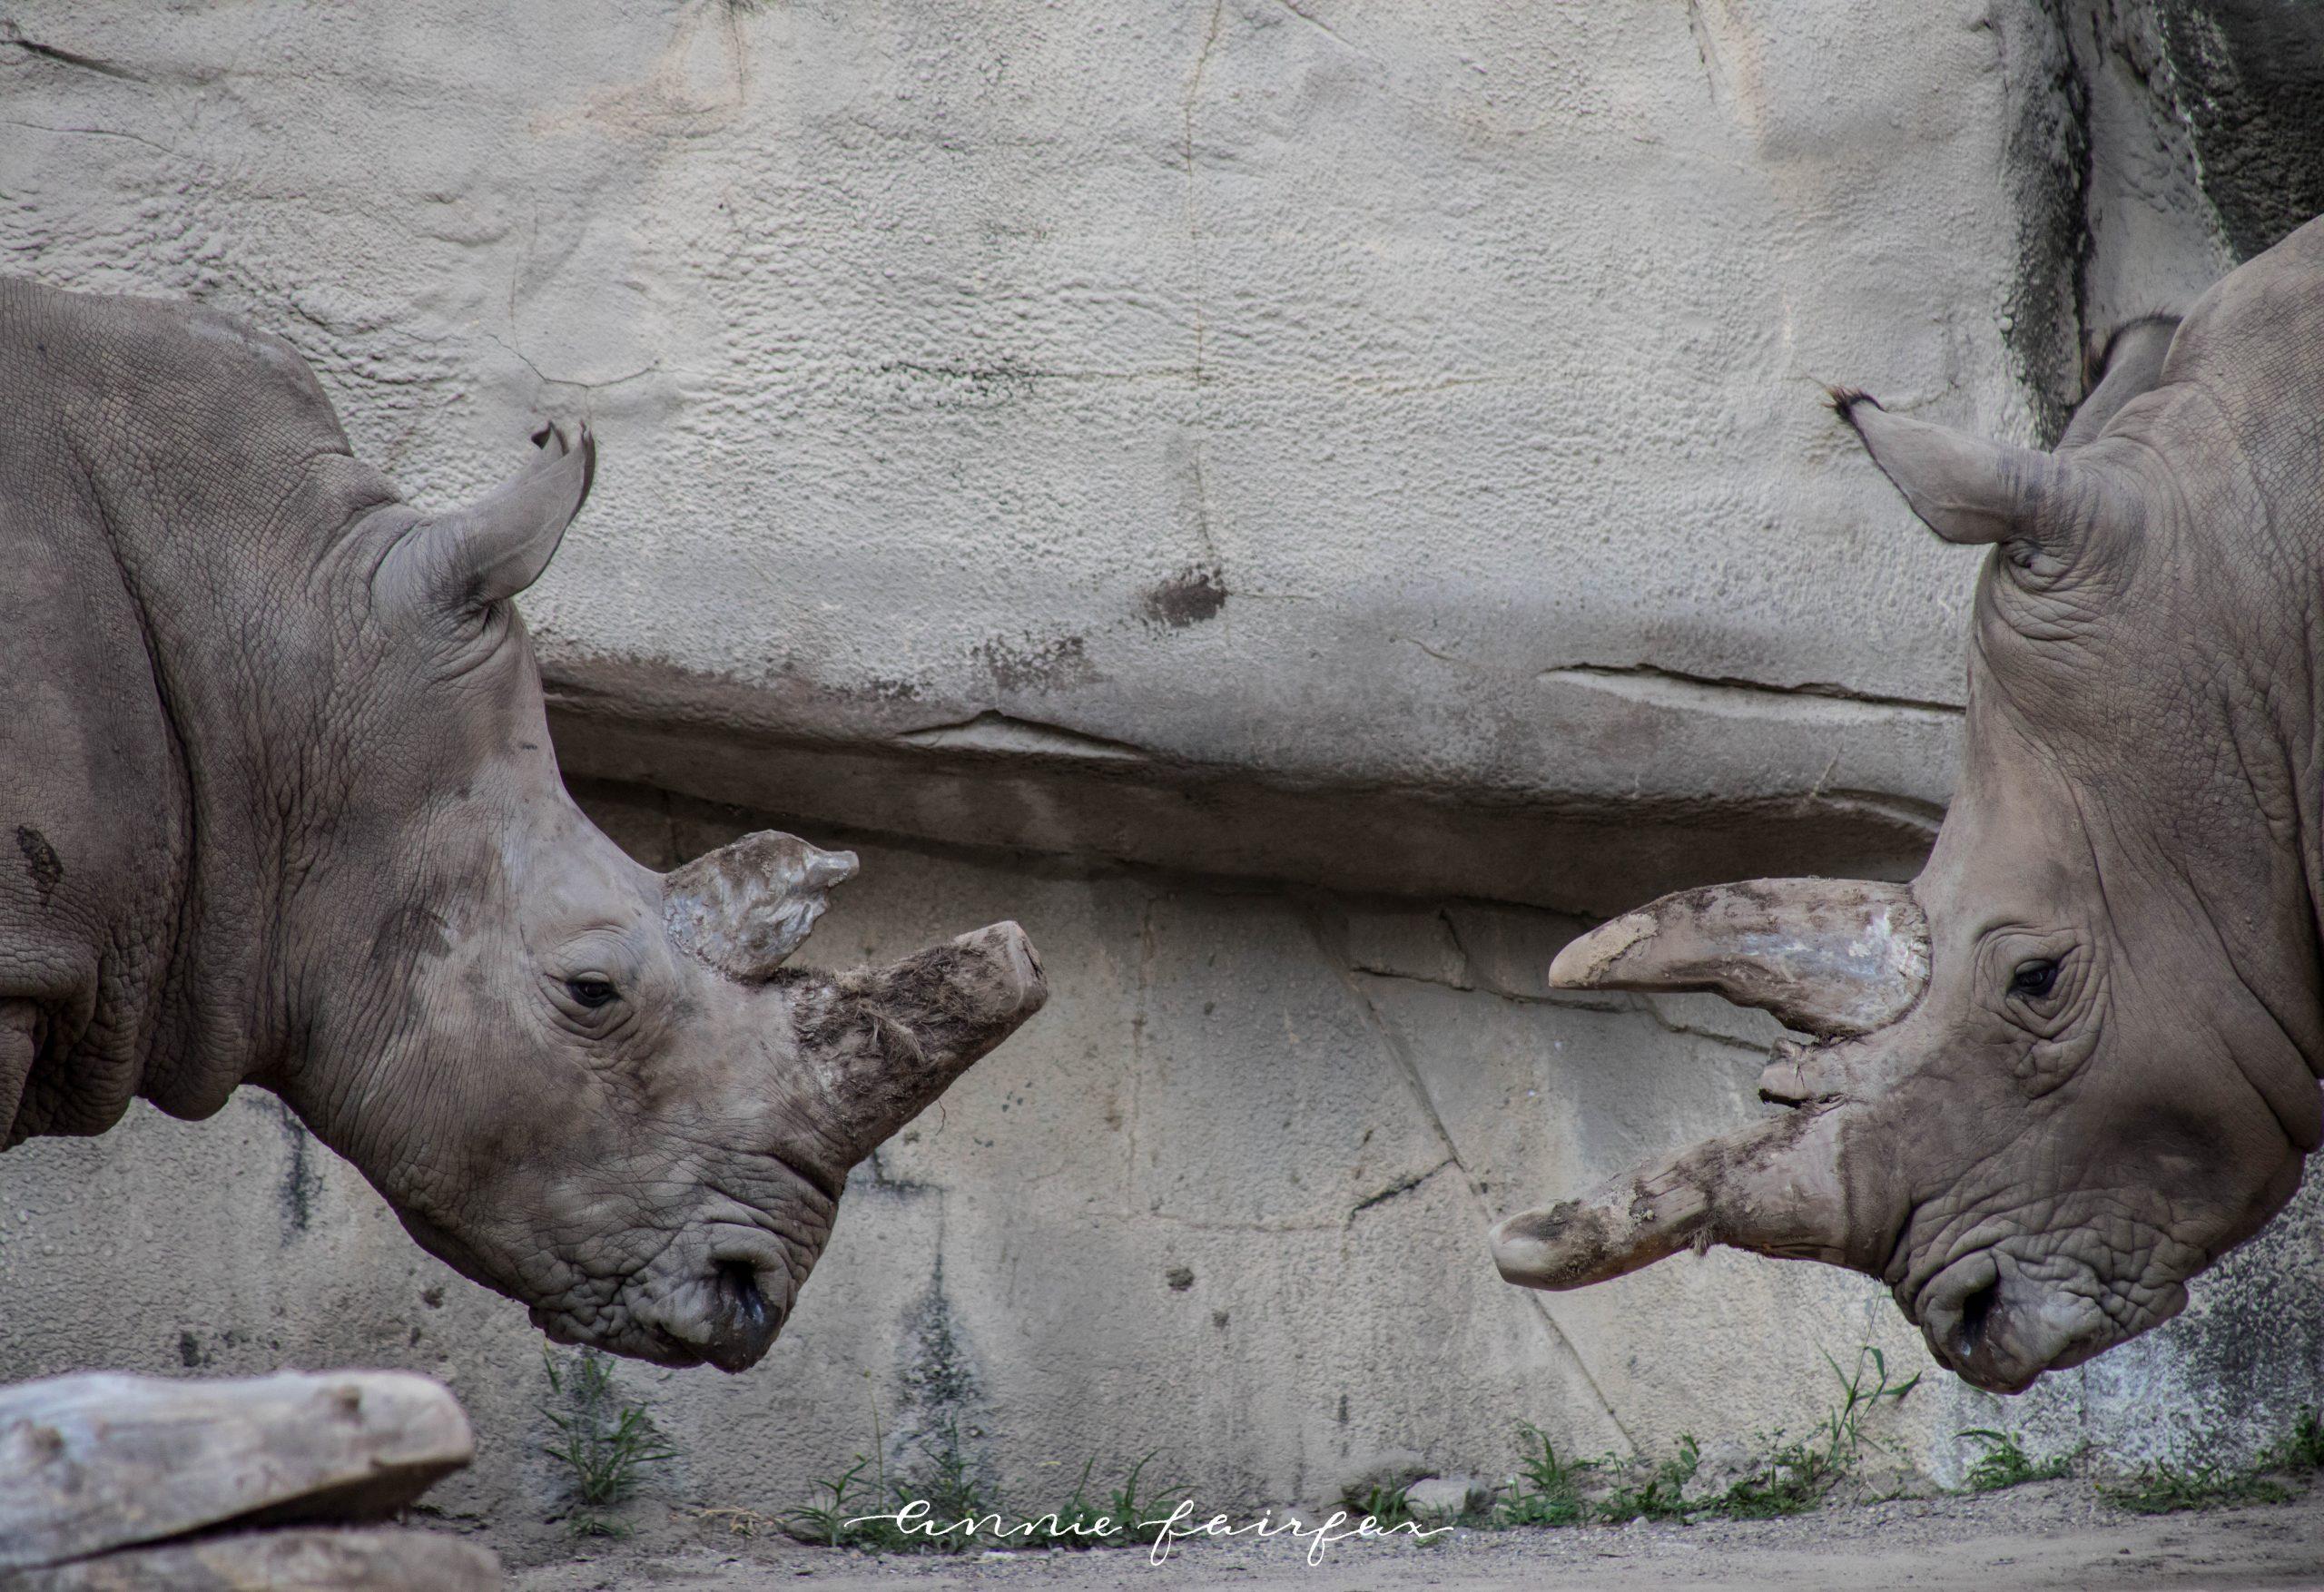 Rhinos at the Detroit Zoo in Royal Oak Michigan by Annie Fairfax